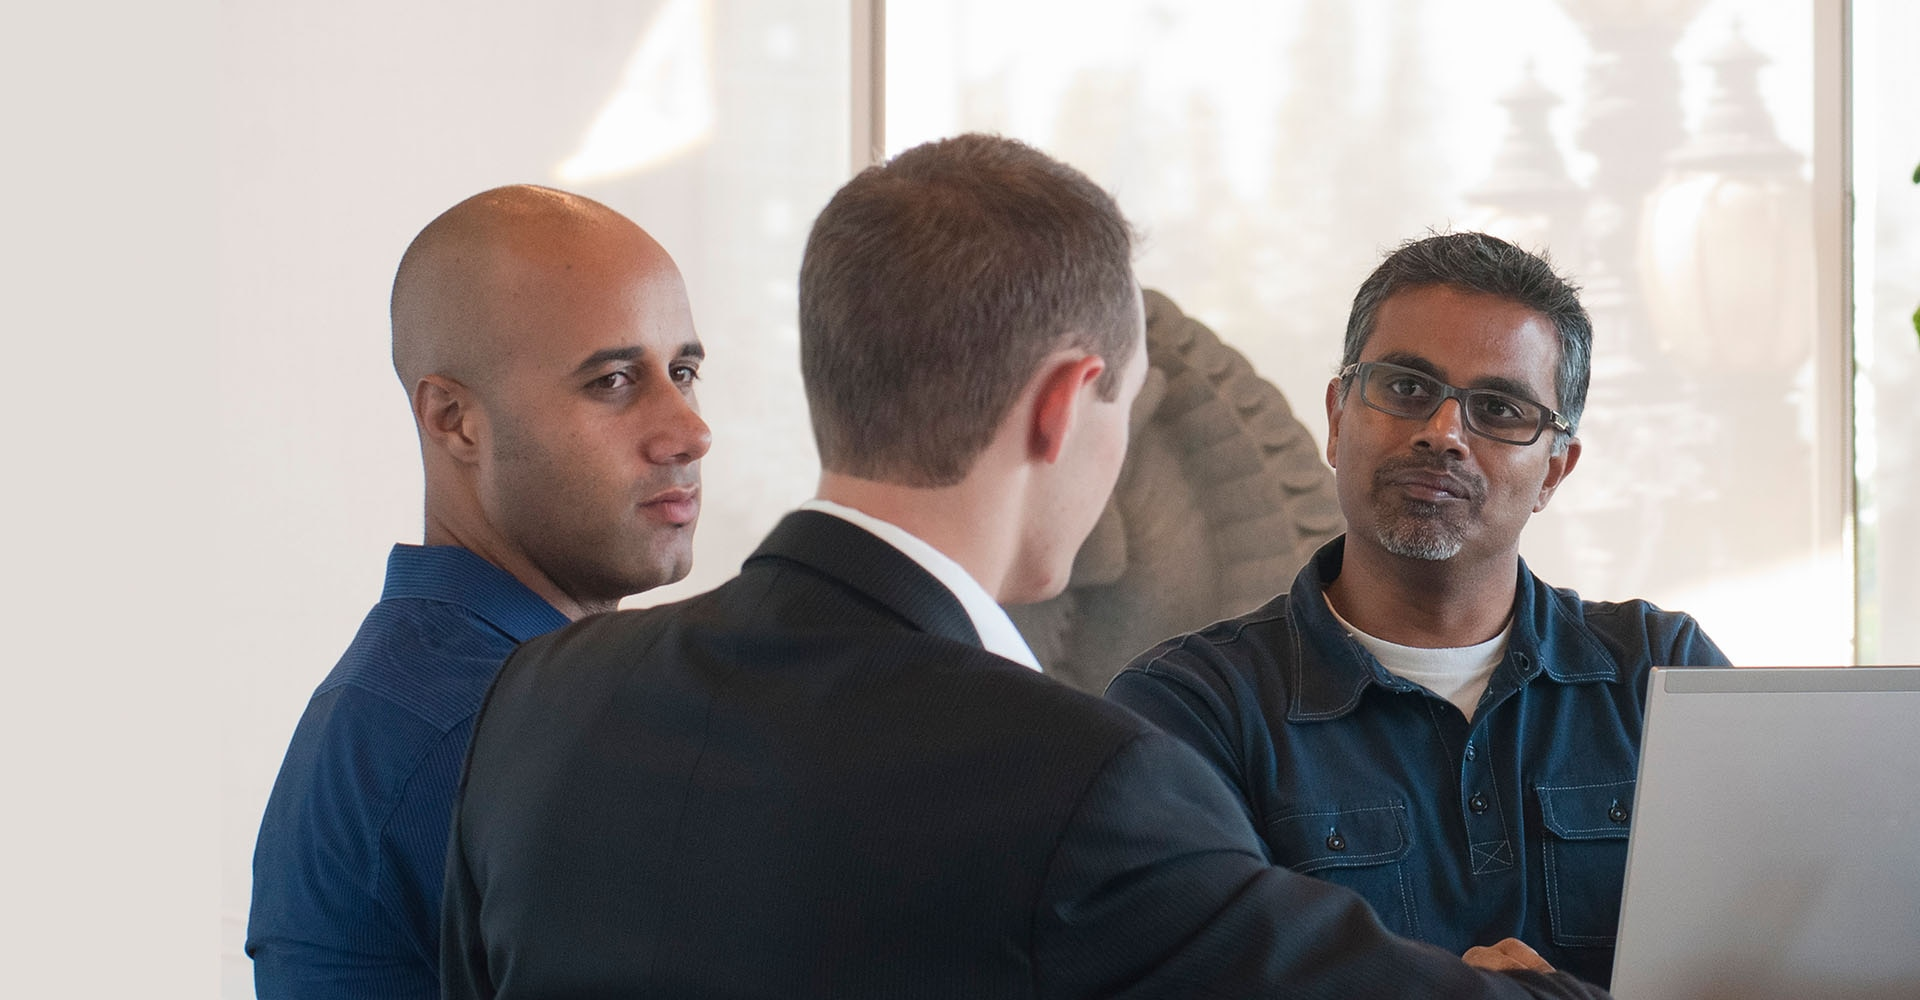 Autodesk 合作夥伴中心:尋找特約合作夥伴